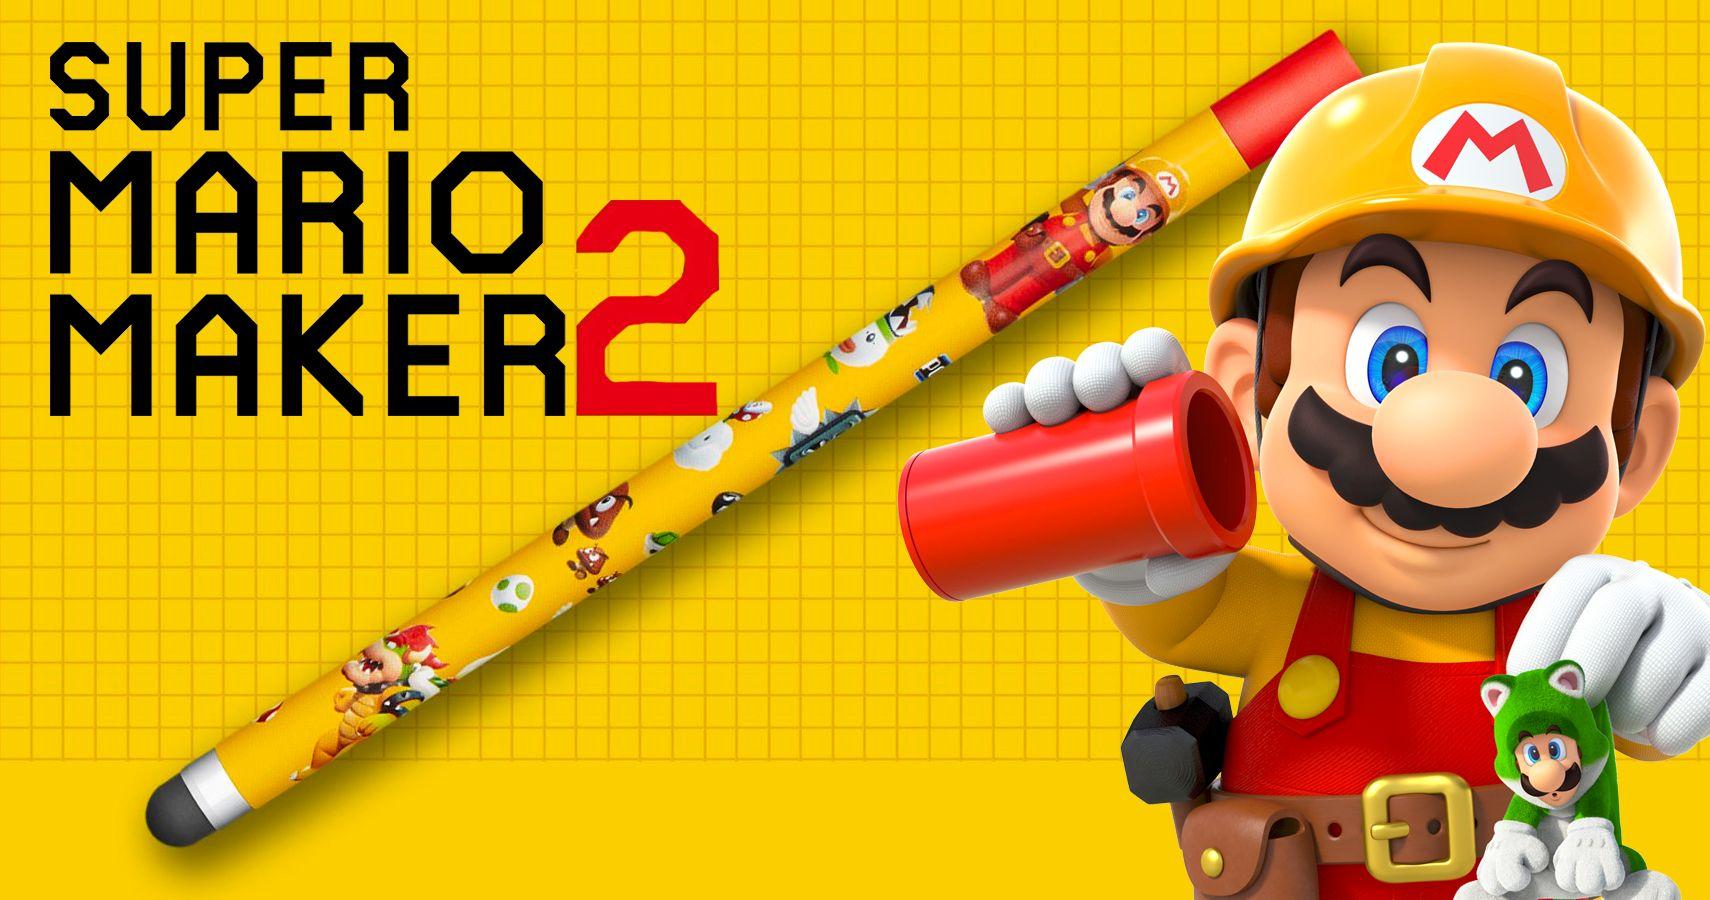 Super Mario Maker 2 Pre-Order Includes Stylus, Suggesting More